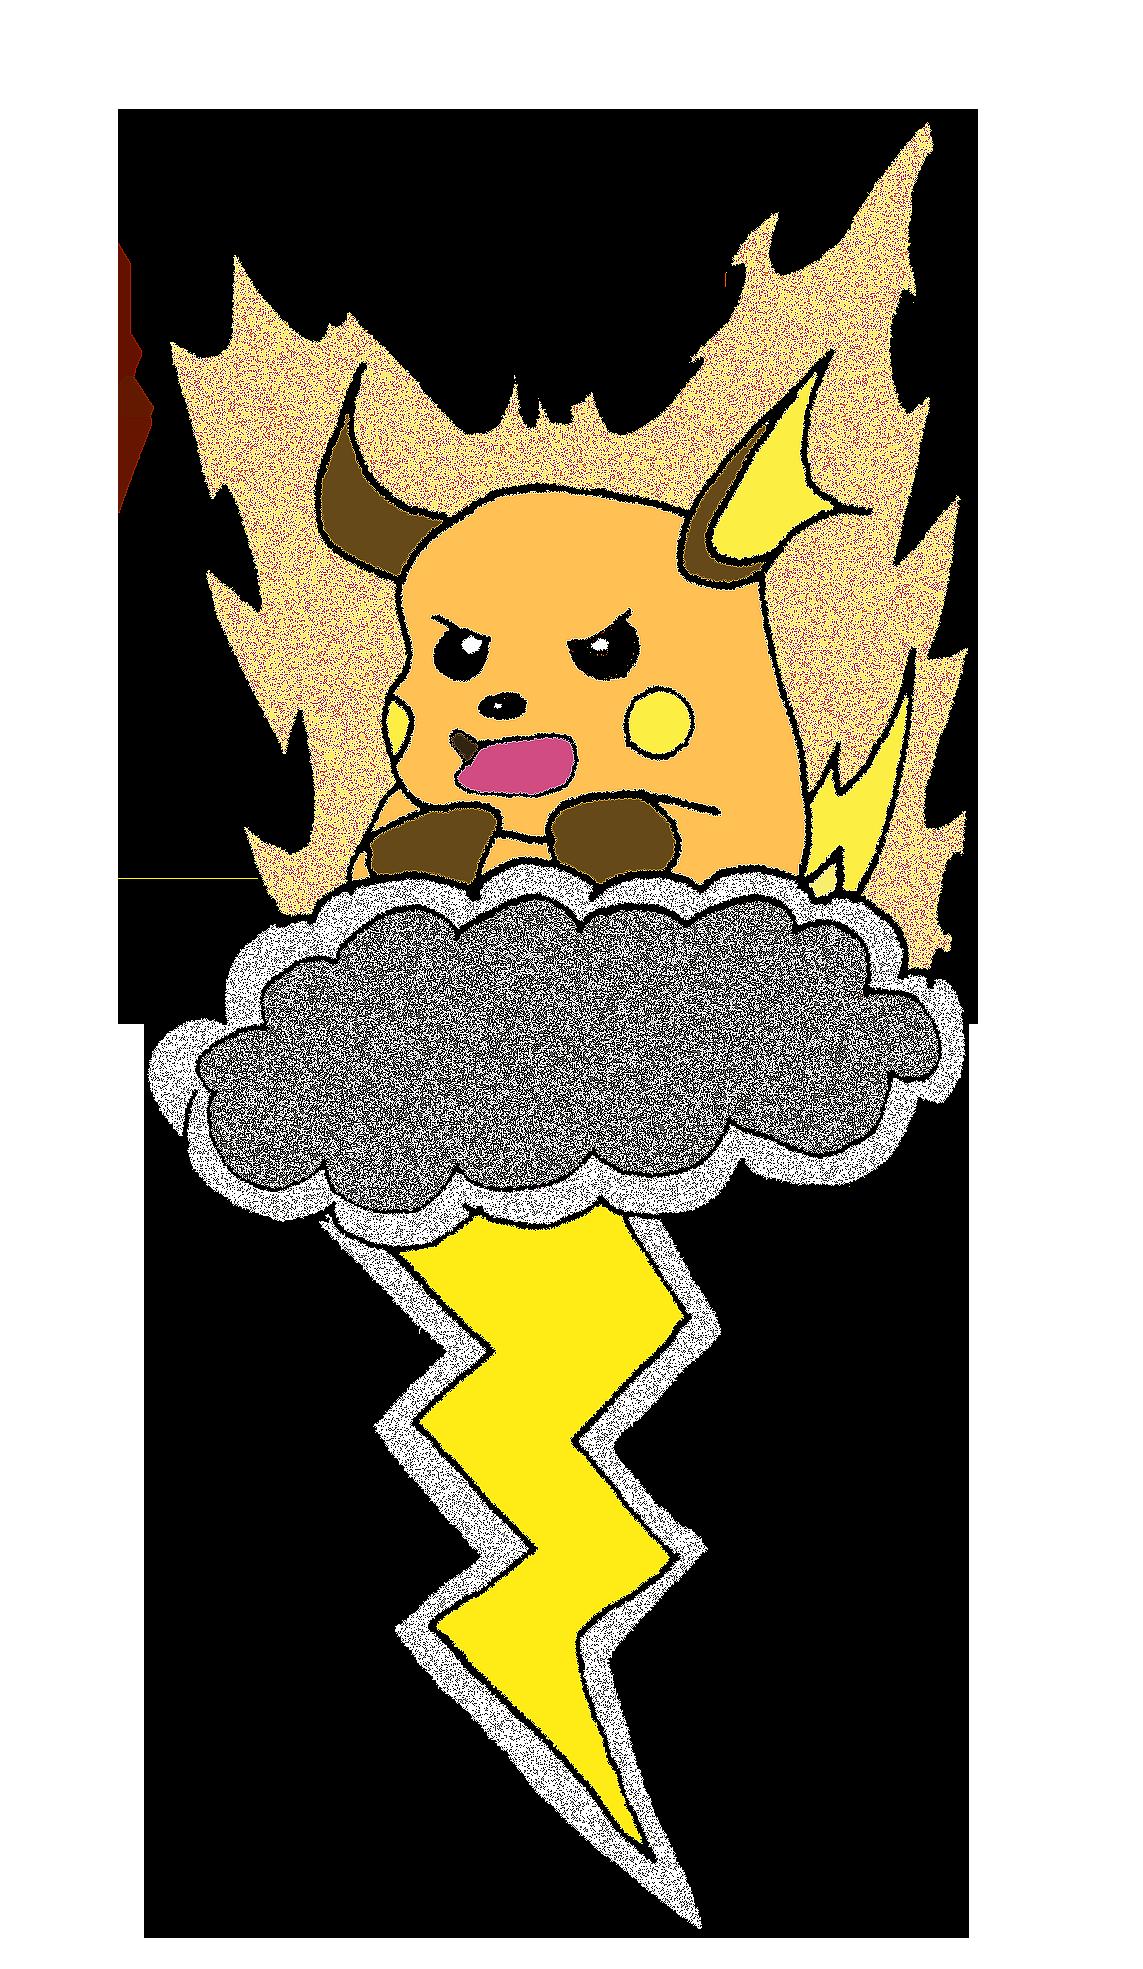 thunder,bolt,storm,cloud,raichu,pokemon Pokemon, Anime